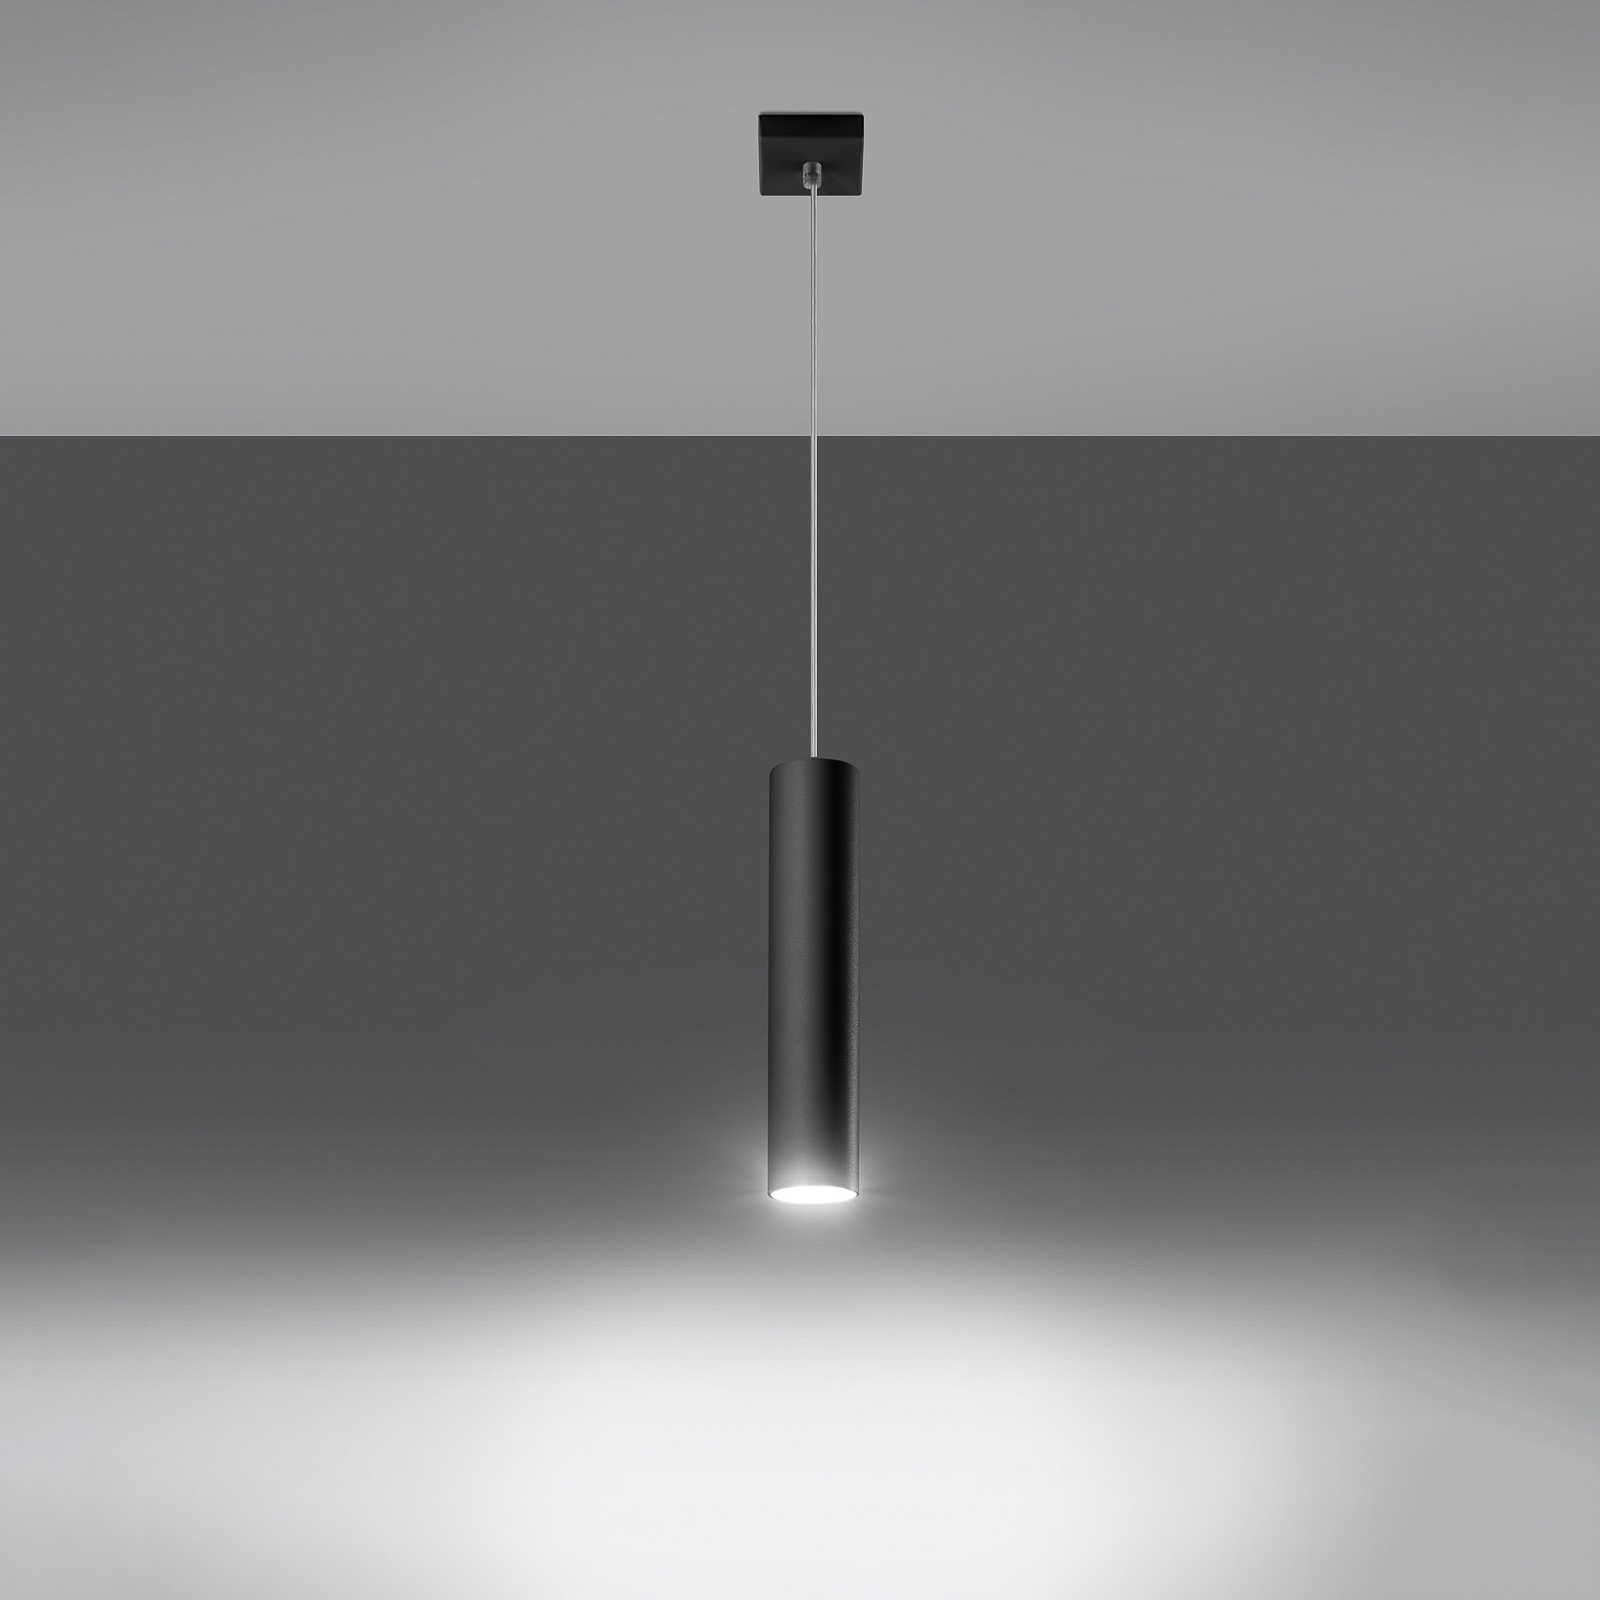 Lampa wisząca Tube, czarna, 1-punktowa